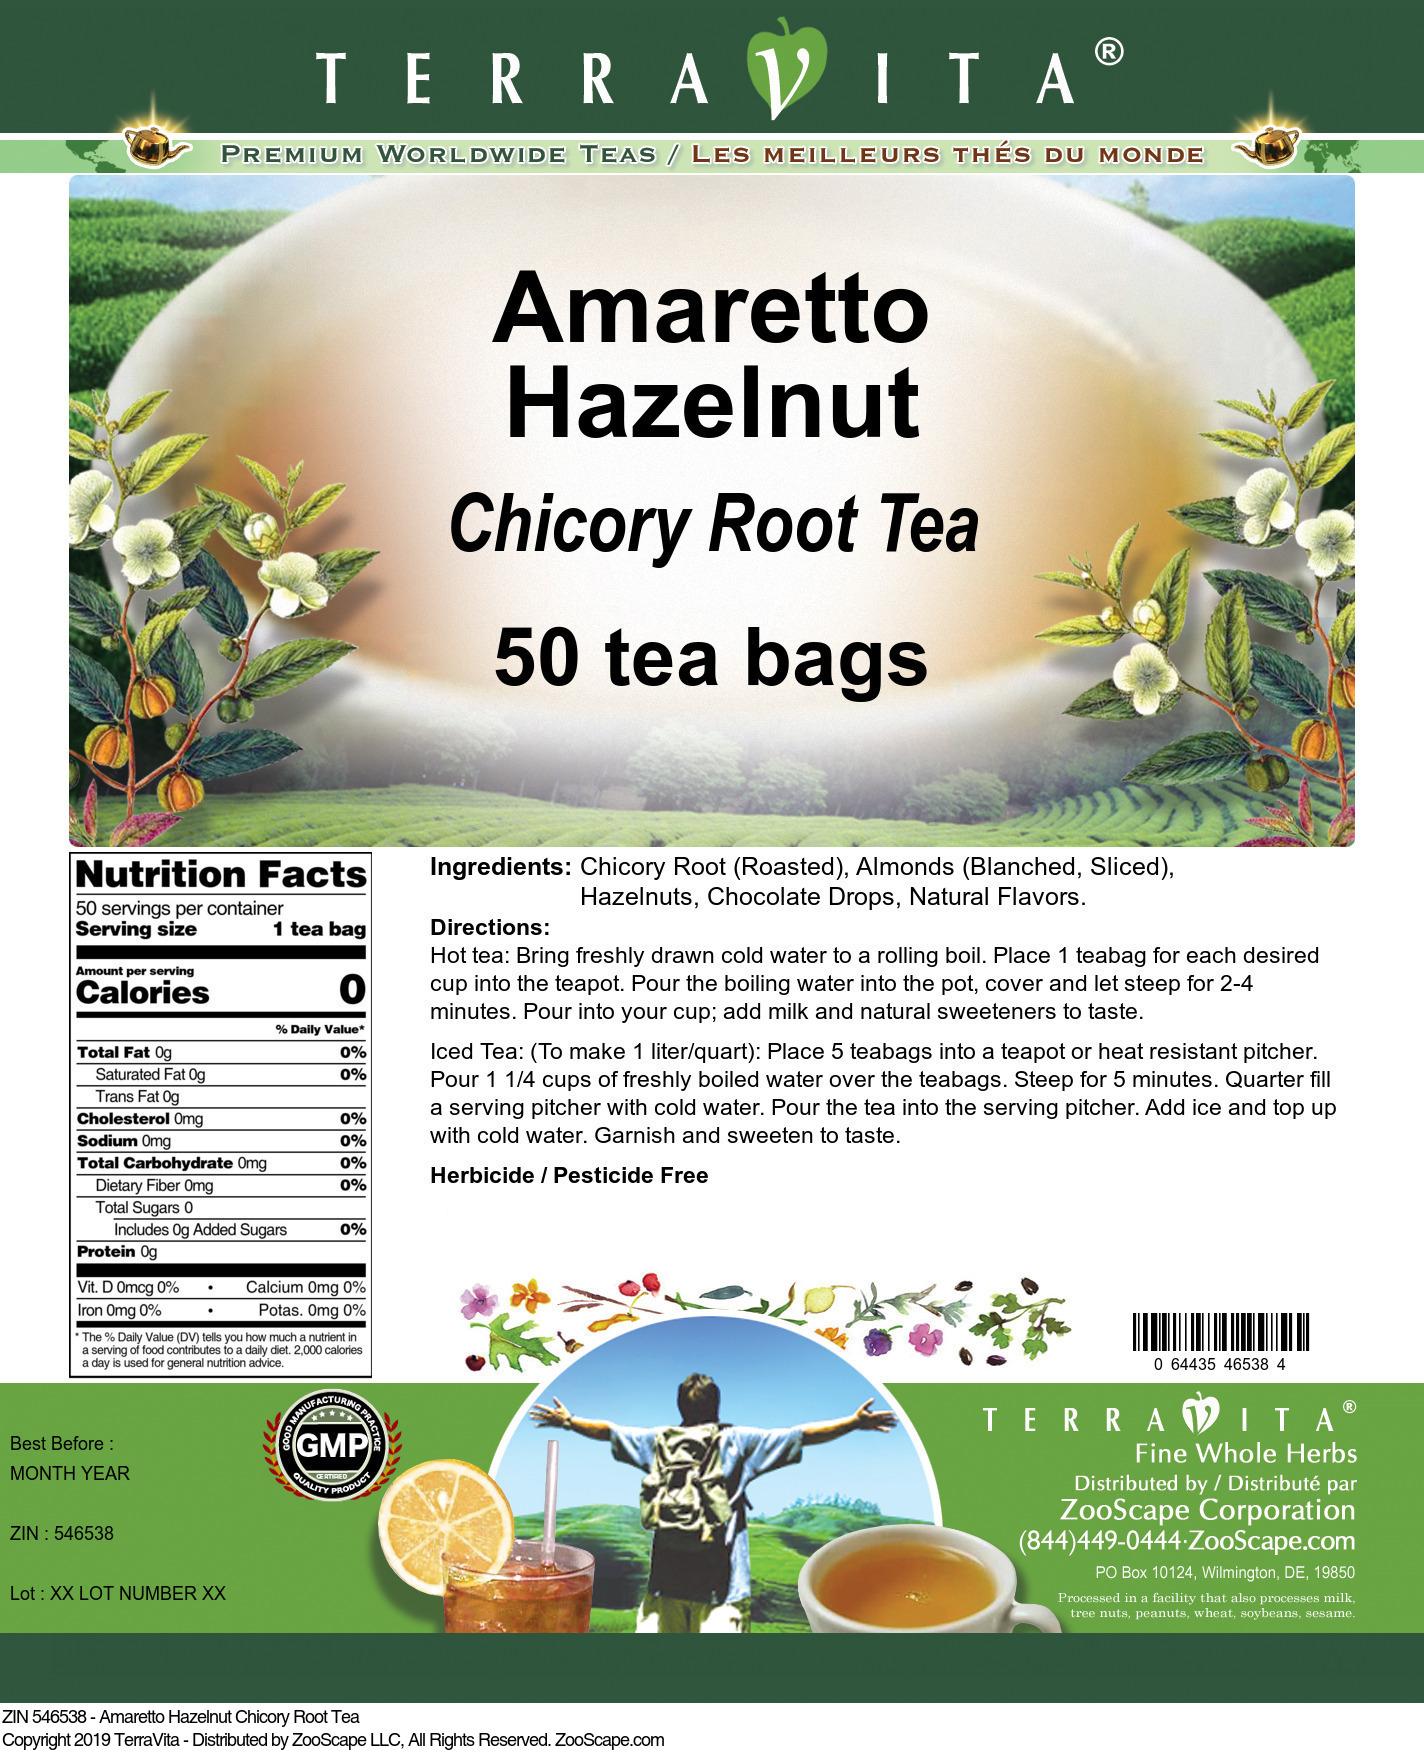 Amaretto Hazelnut Chicory Root Tea